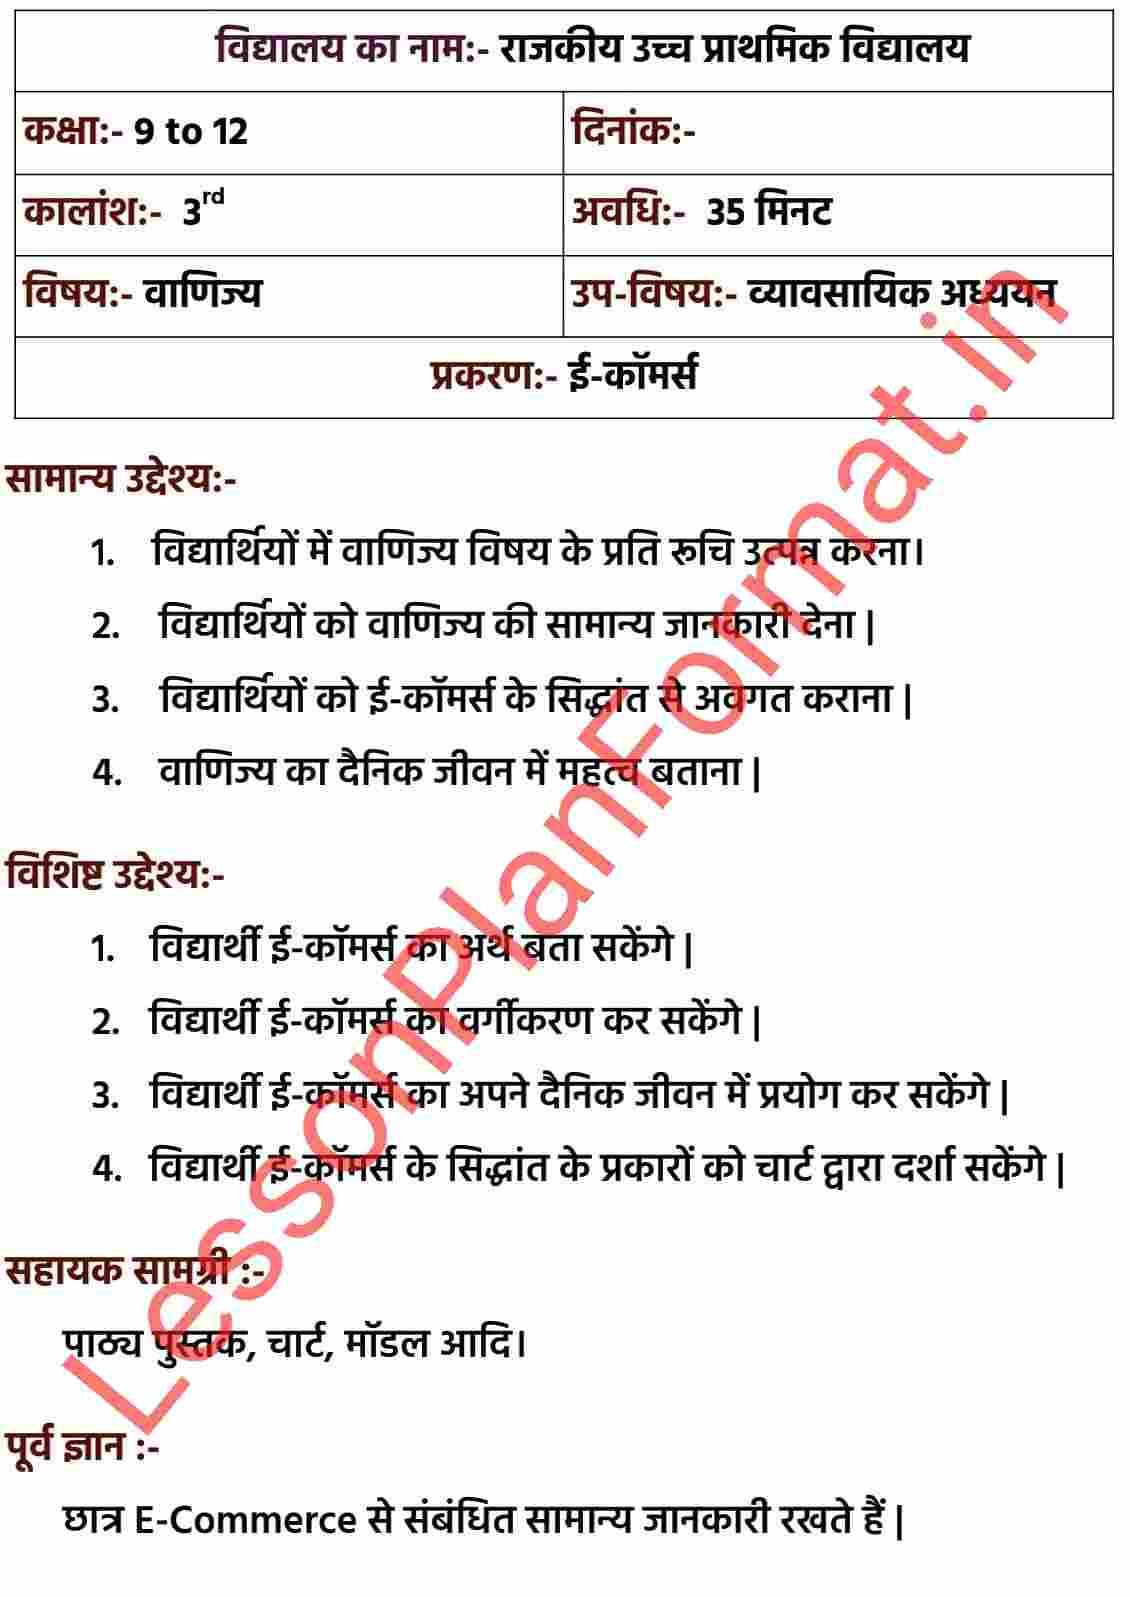 E-Commerce Lesson Plan in Hindi